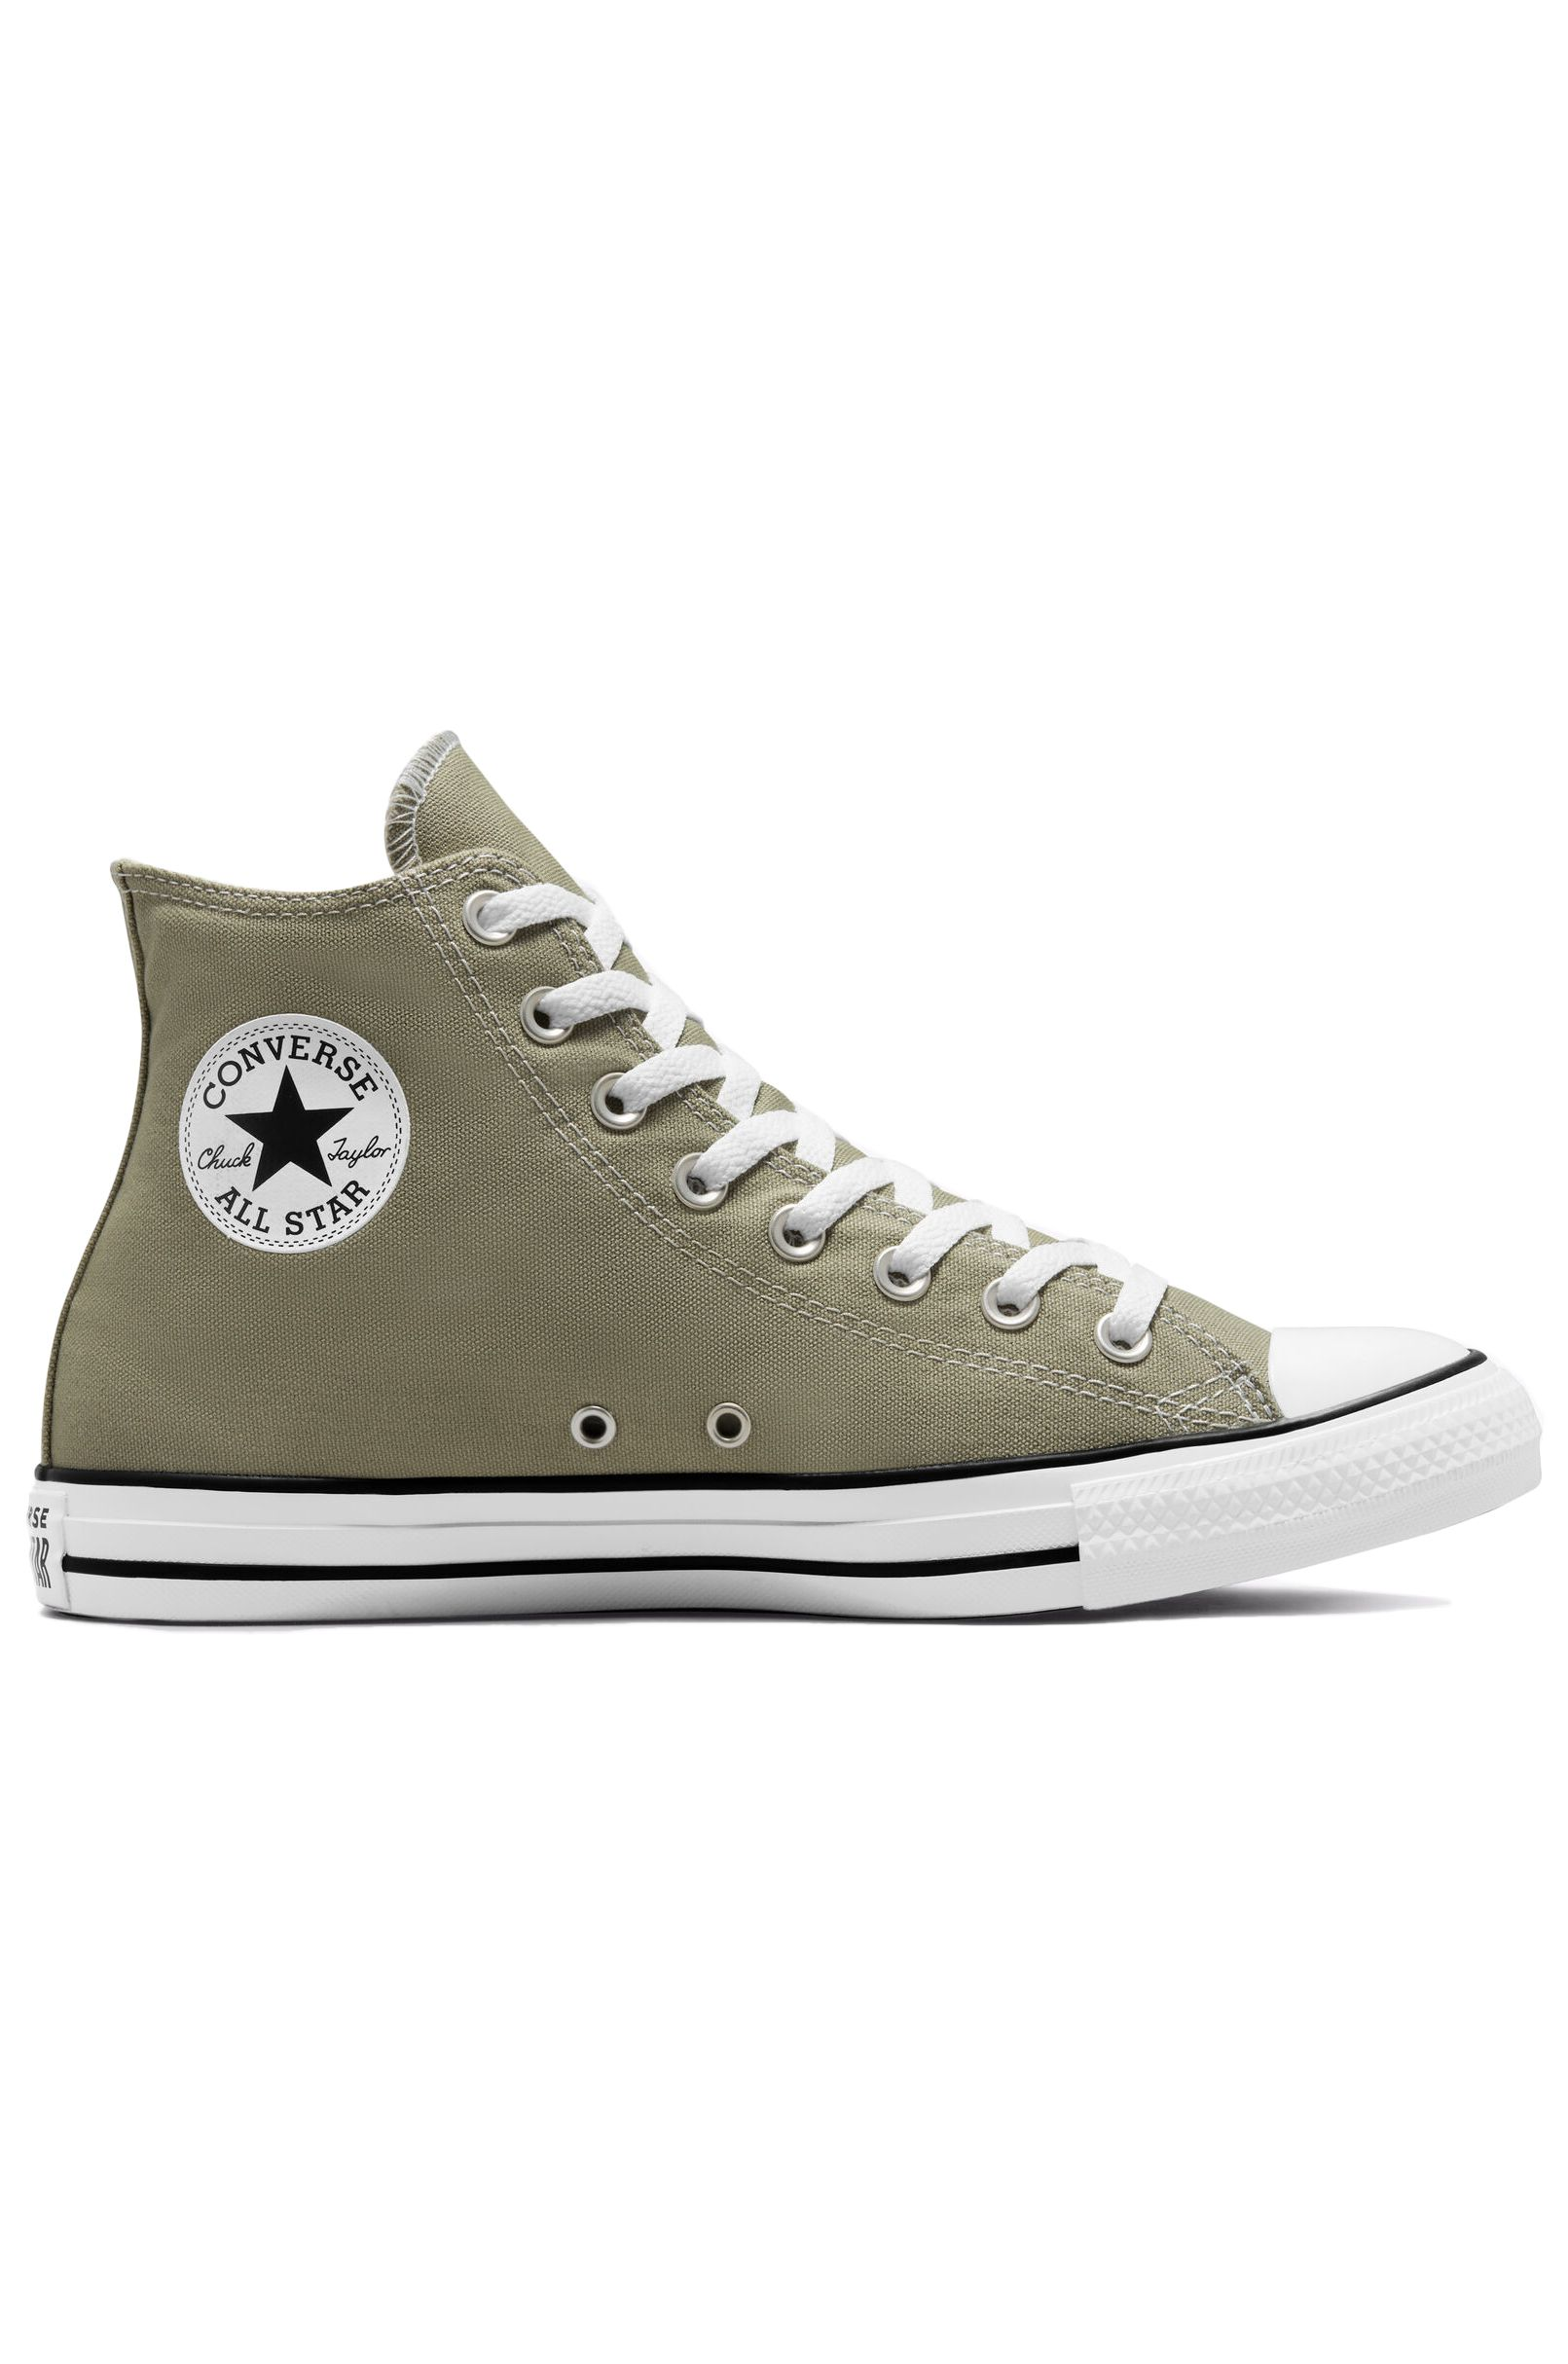 Converse Shoes CHUCK TAYLOR ALL STAR HI Light Field Surplus